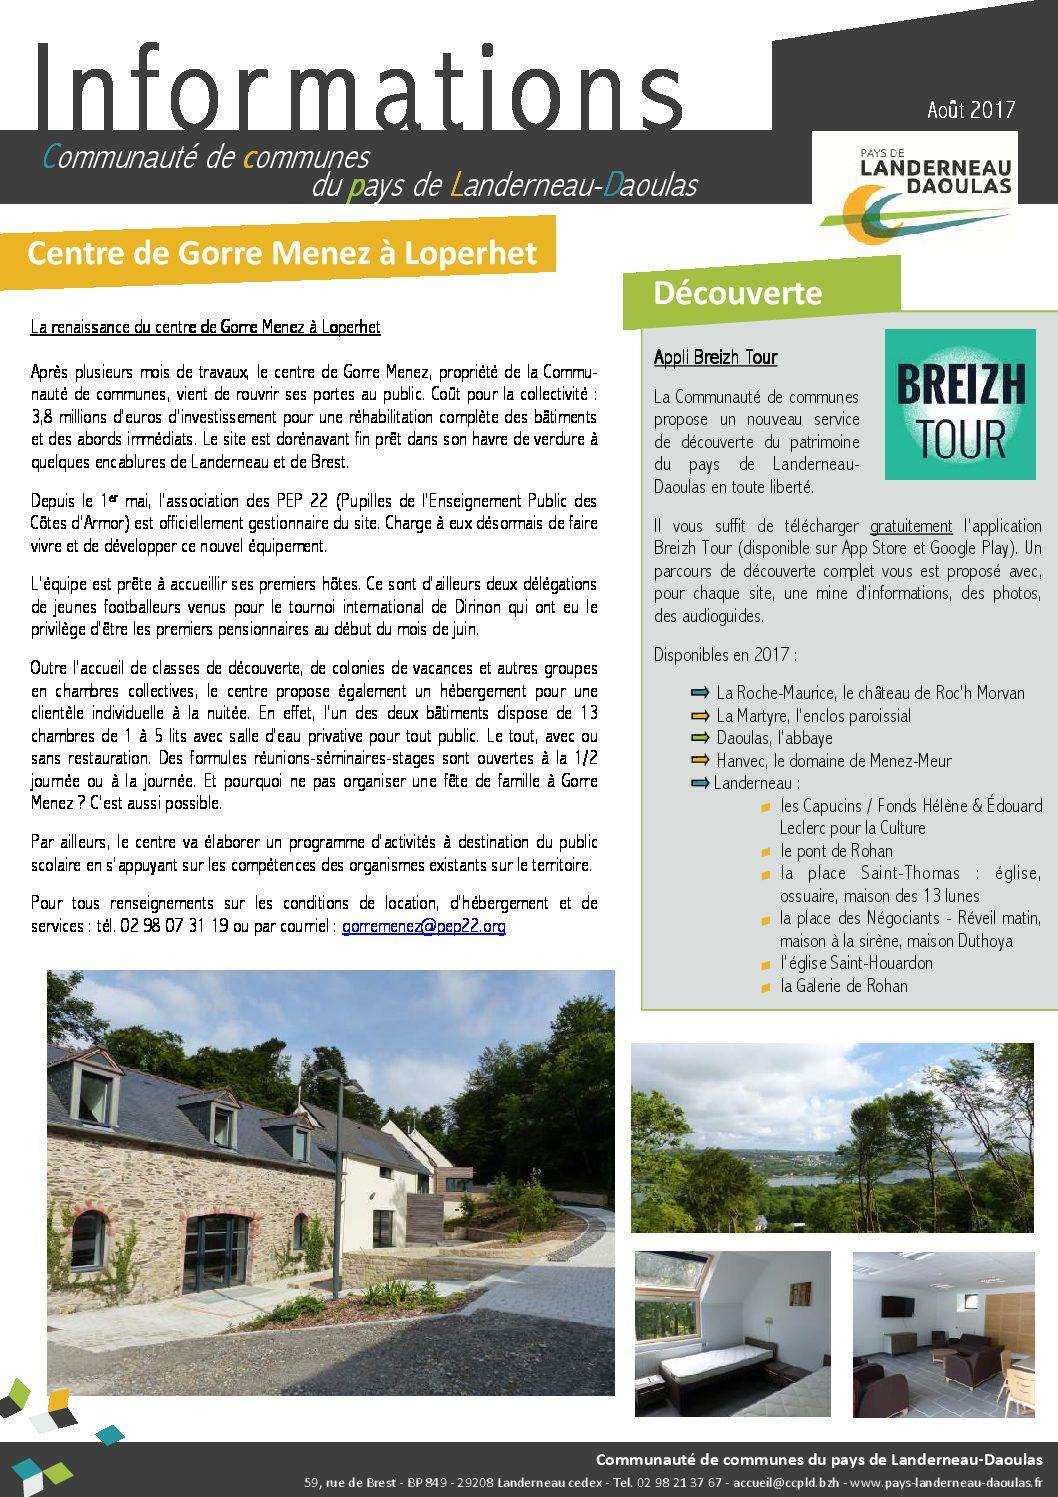 CCPLD Info - Août 2017 : Centre de Gorre Menez